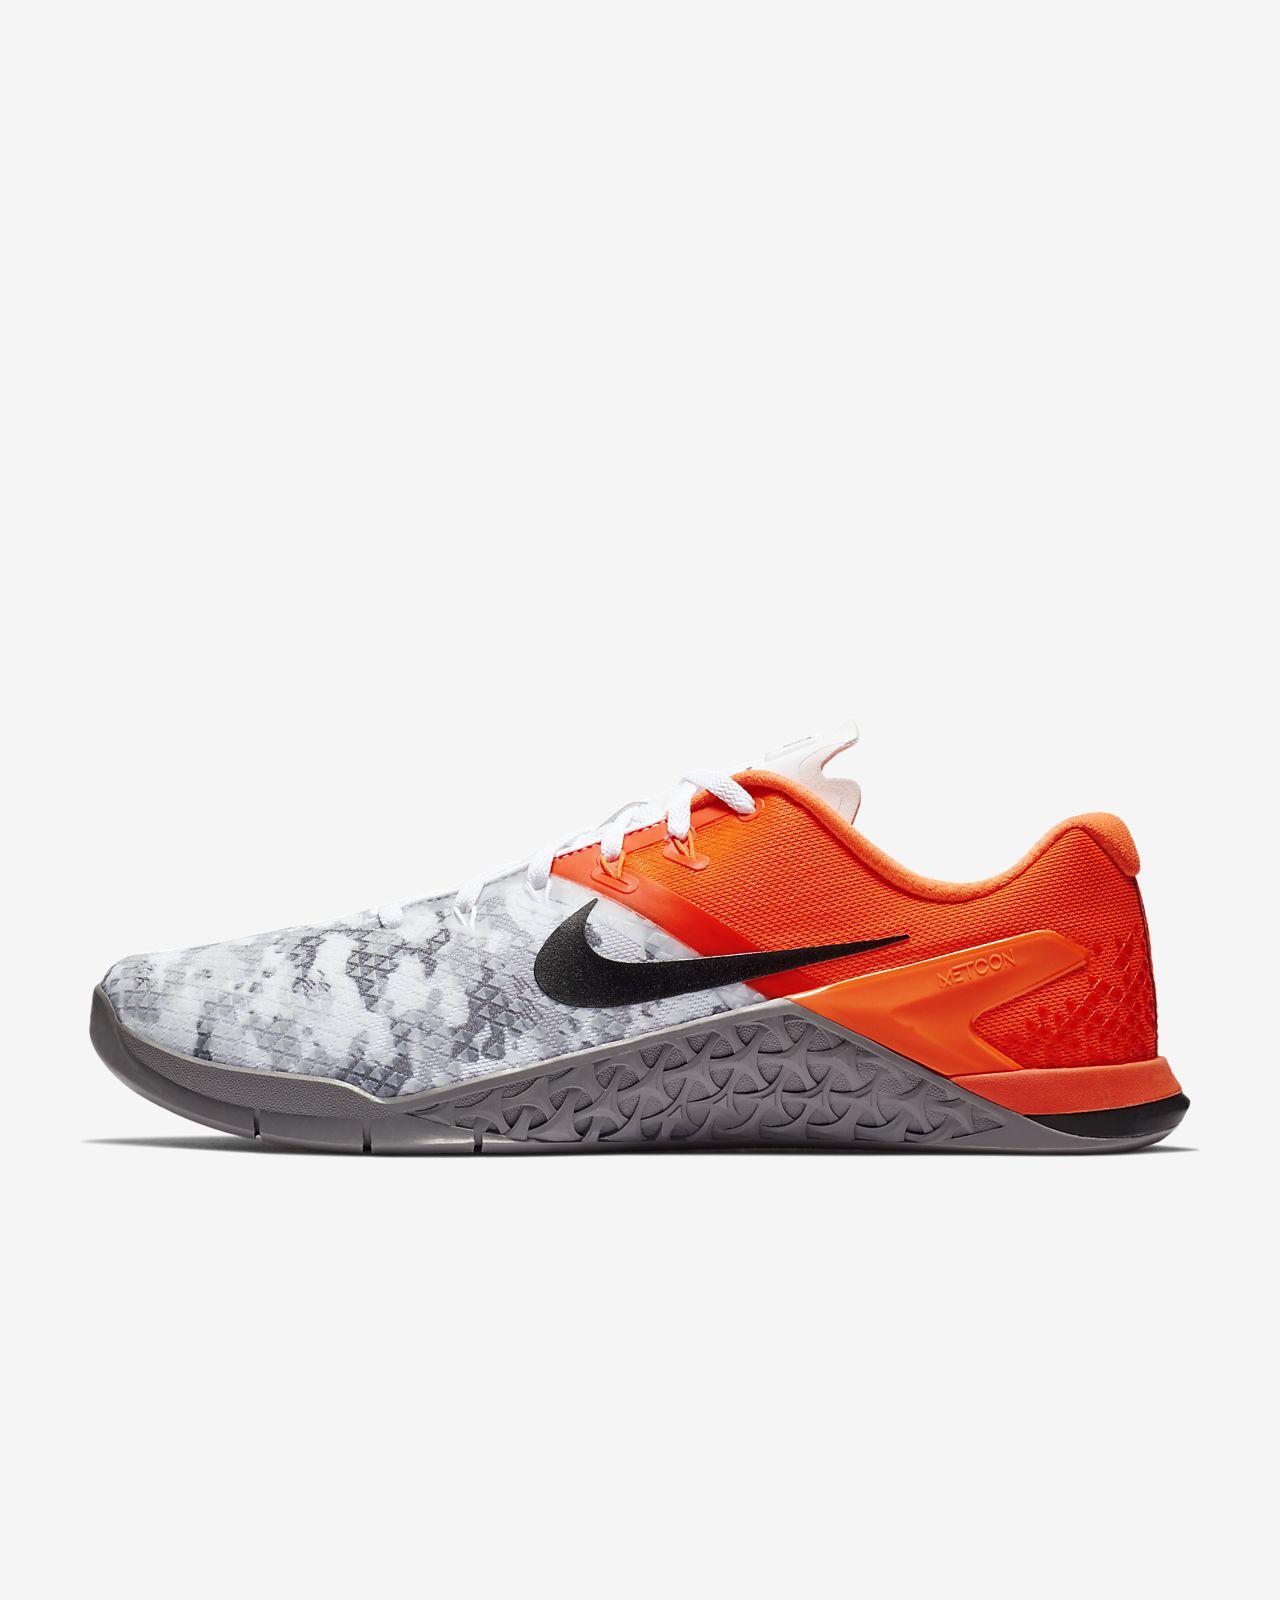 f8fbecfdcfed9e Und Training Nike 4 Gewichtheberschuh Xd F Cross Metcon TTXqAP